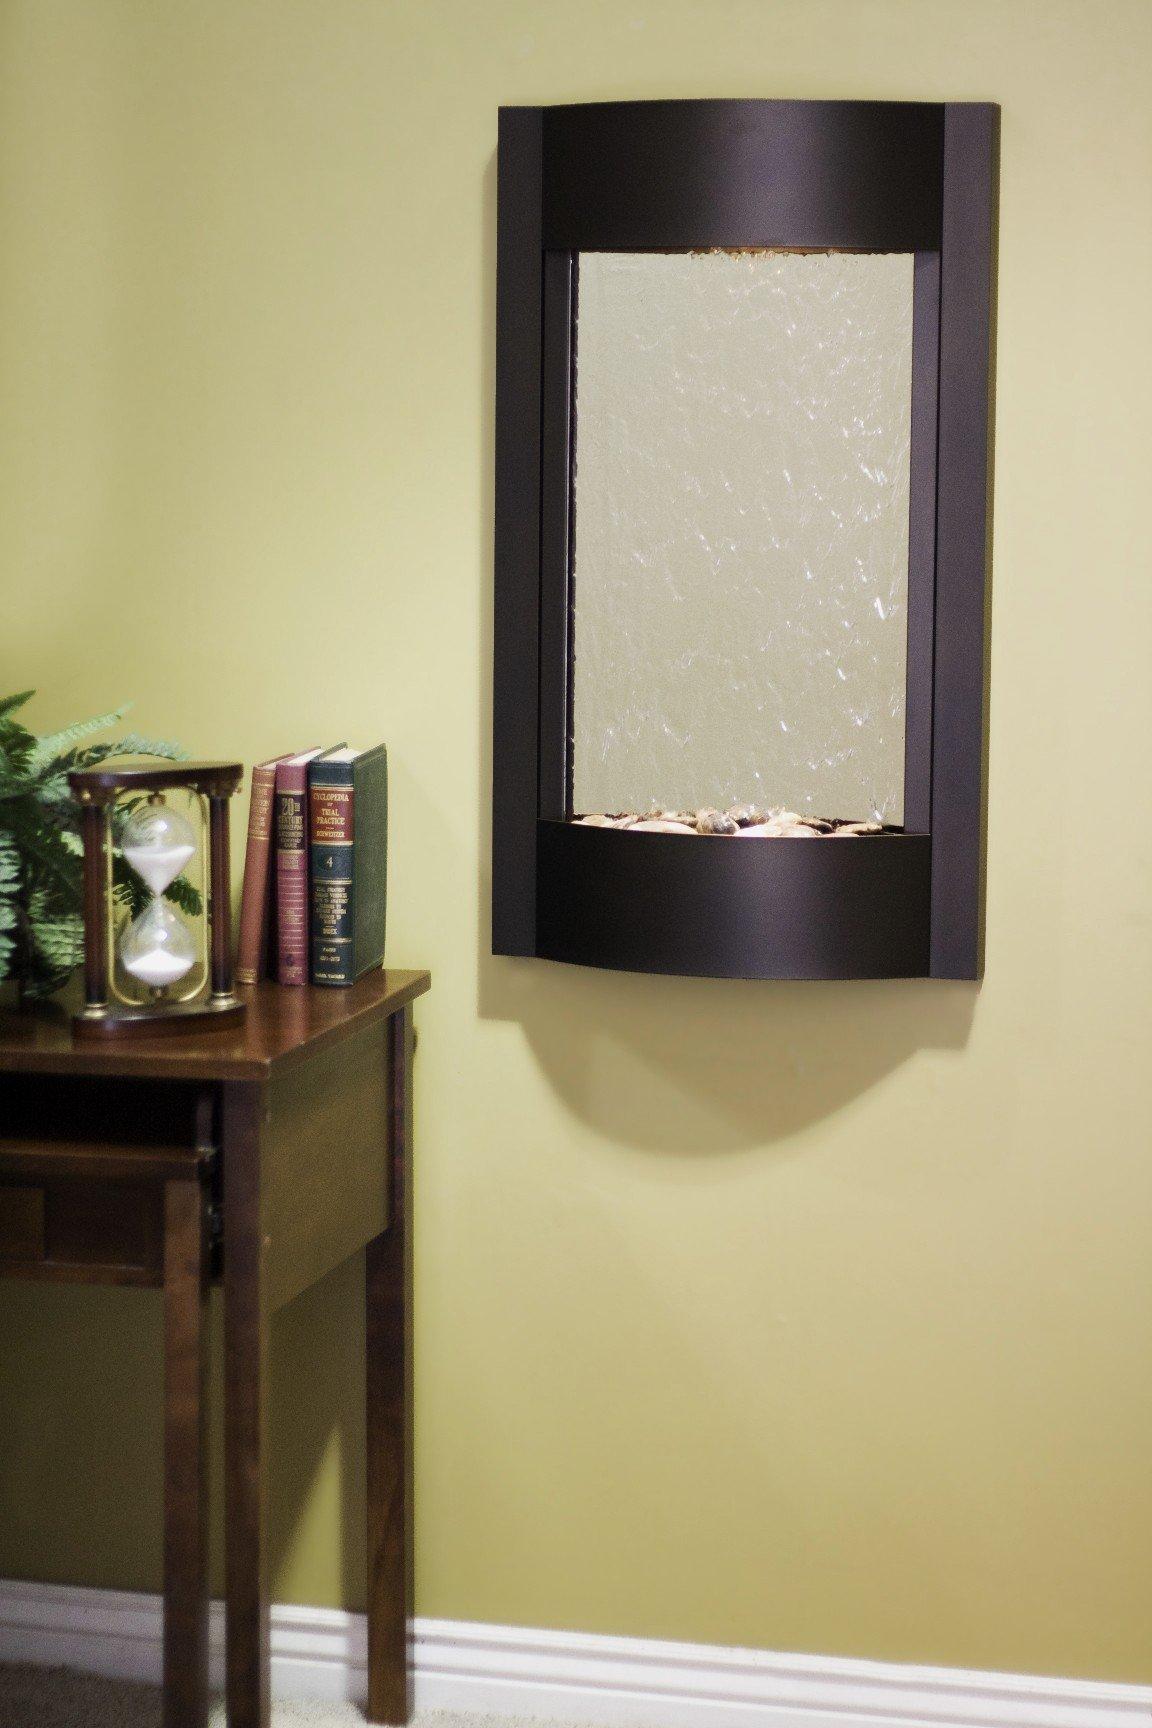 Adagio Serene Waters Wall Fountain - Silver Mirror, Antique Bronze Frame